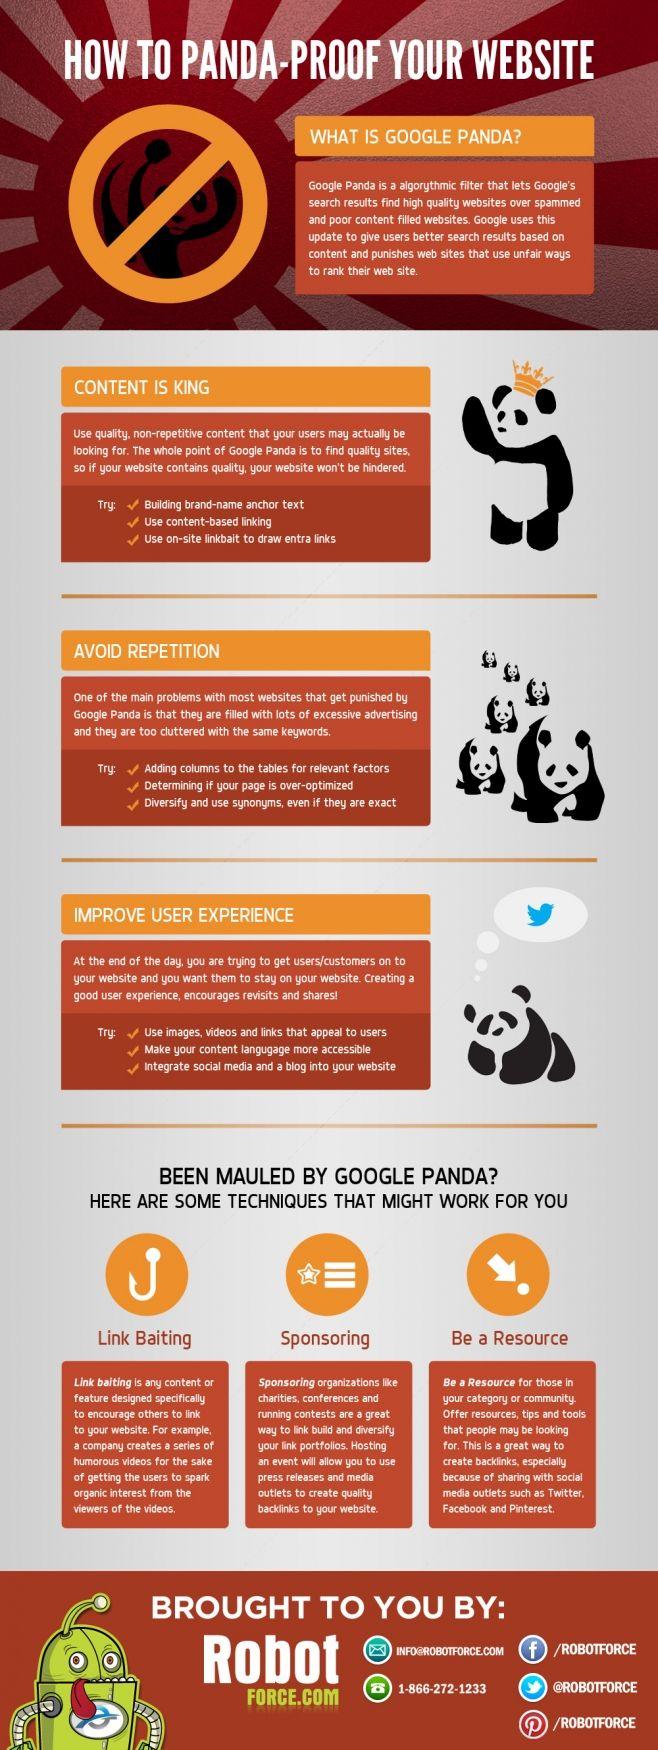 Cómo Google Panda prueba tu sitio #infografia #infographic #seo